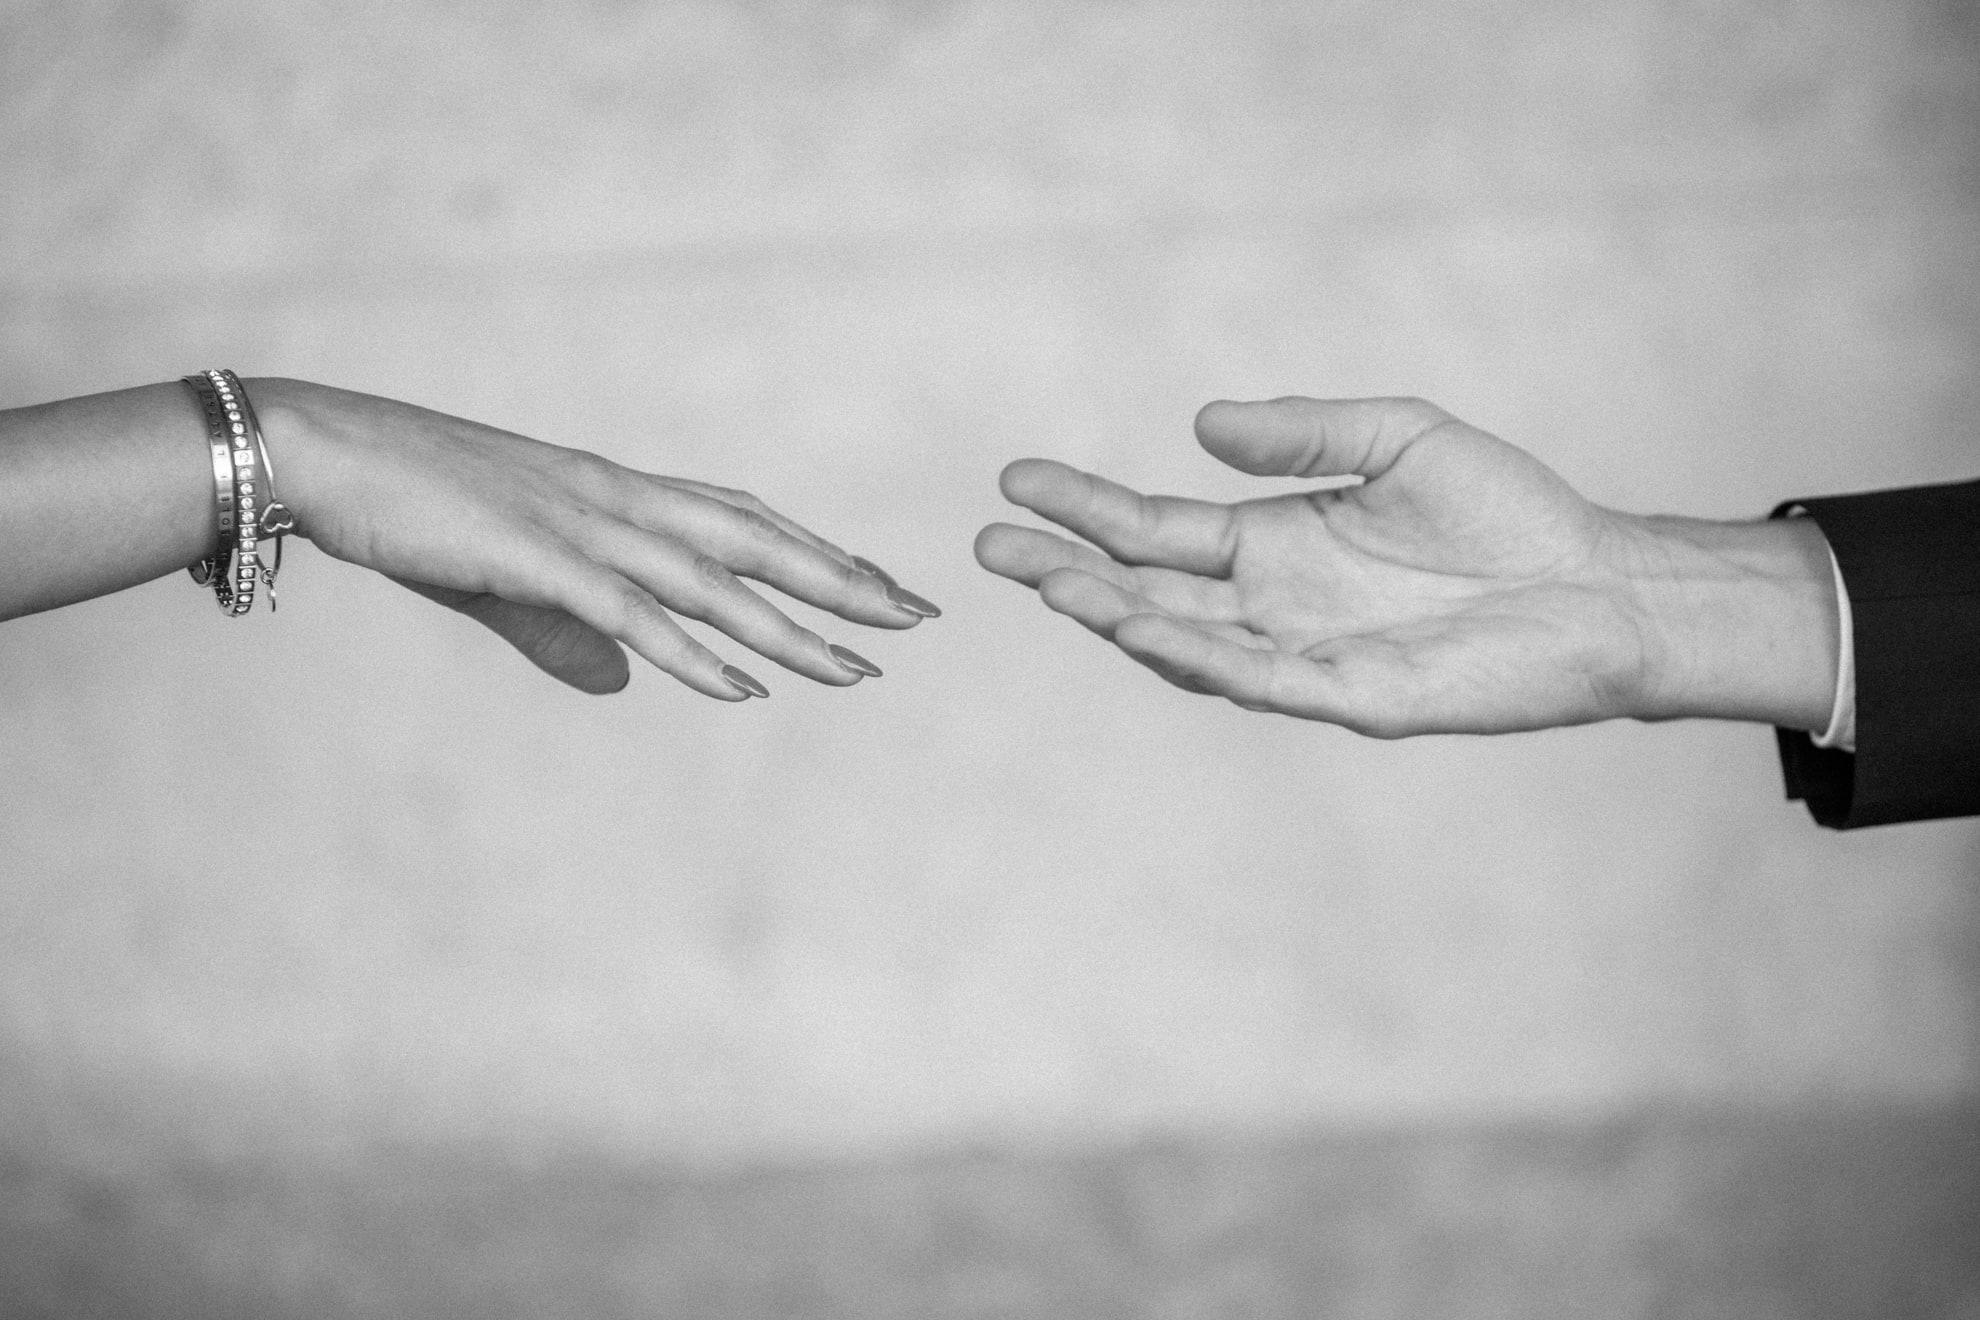 engagement venice venezia proposal proposta matrimonio fidanzamento irene pollacchi fotografa 35